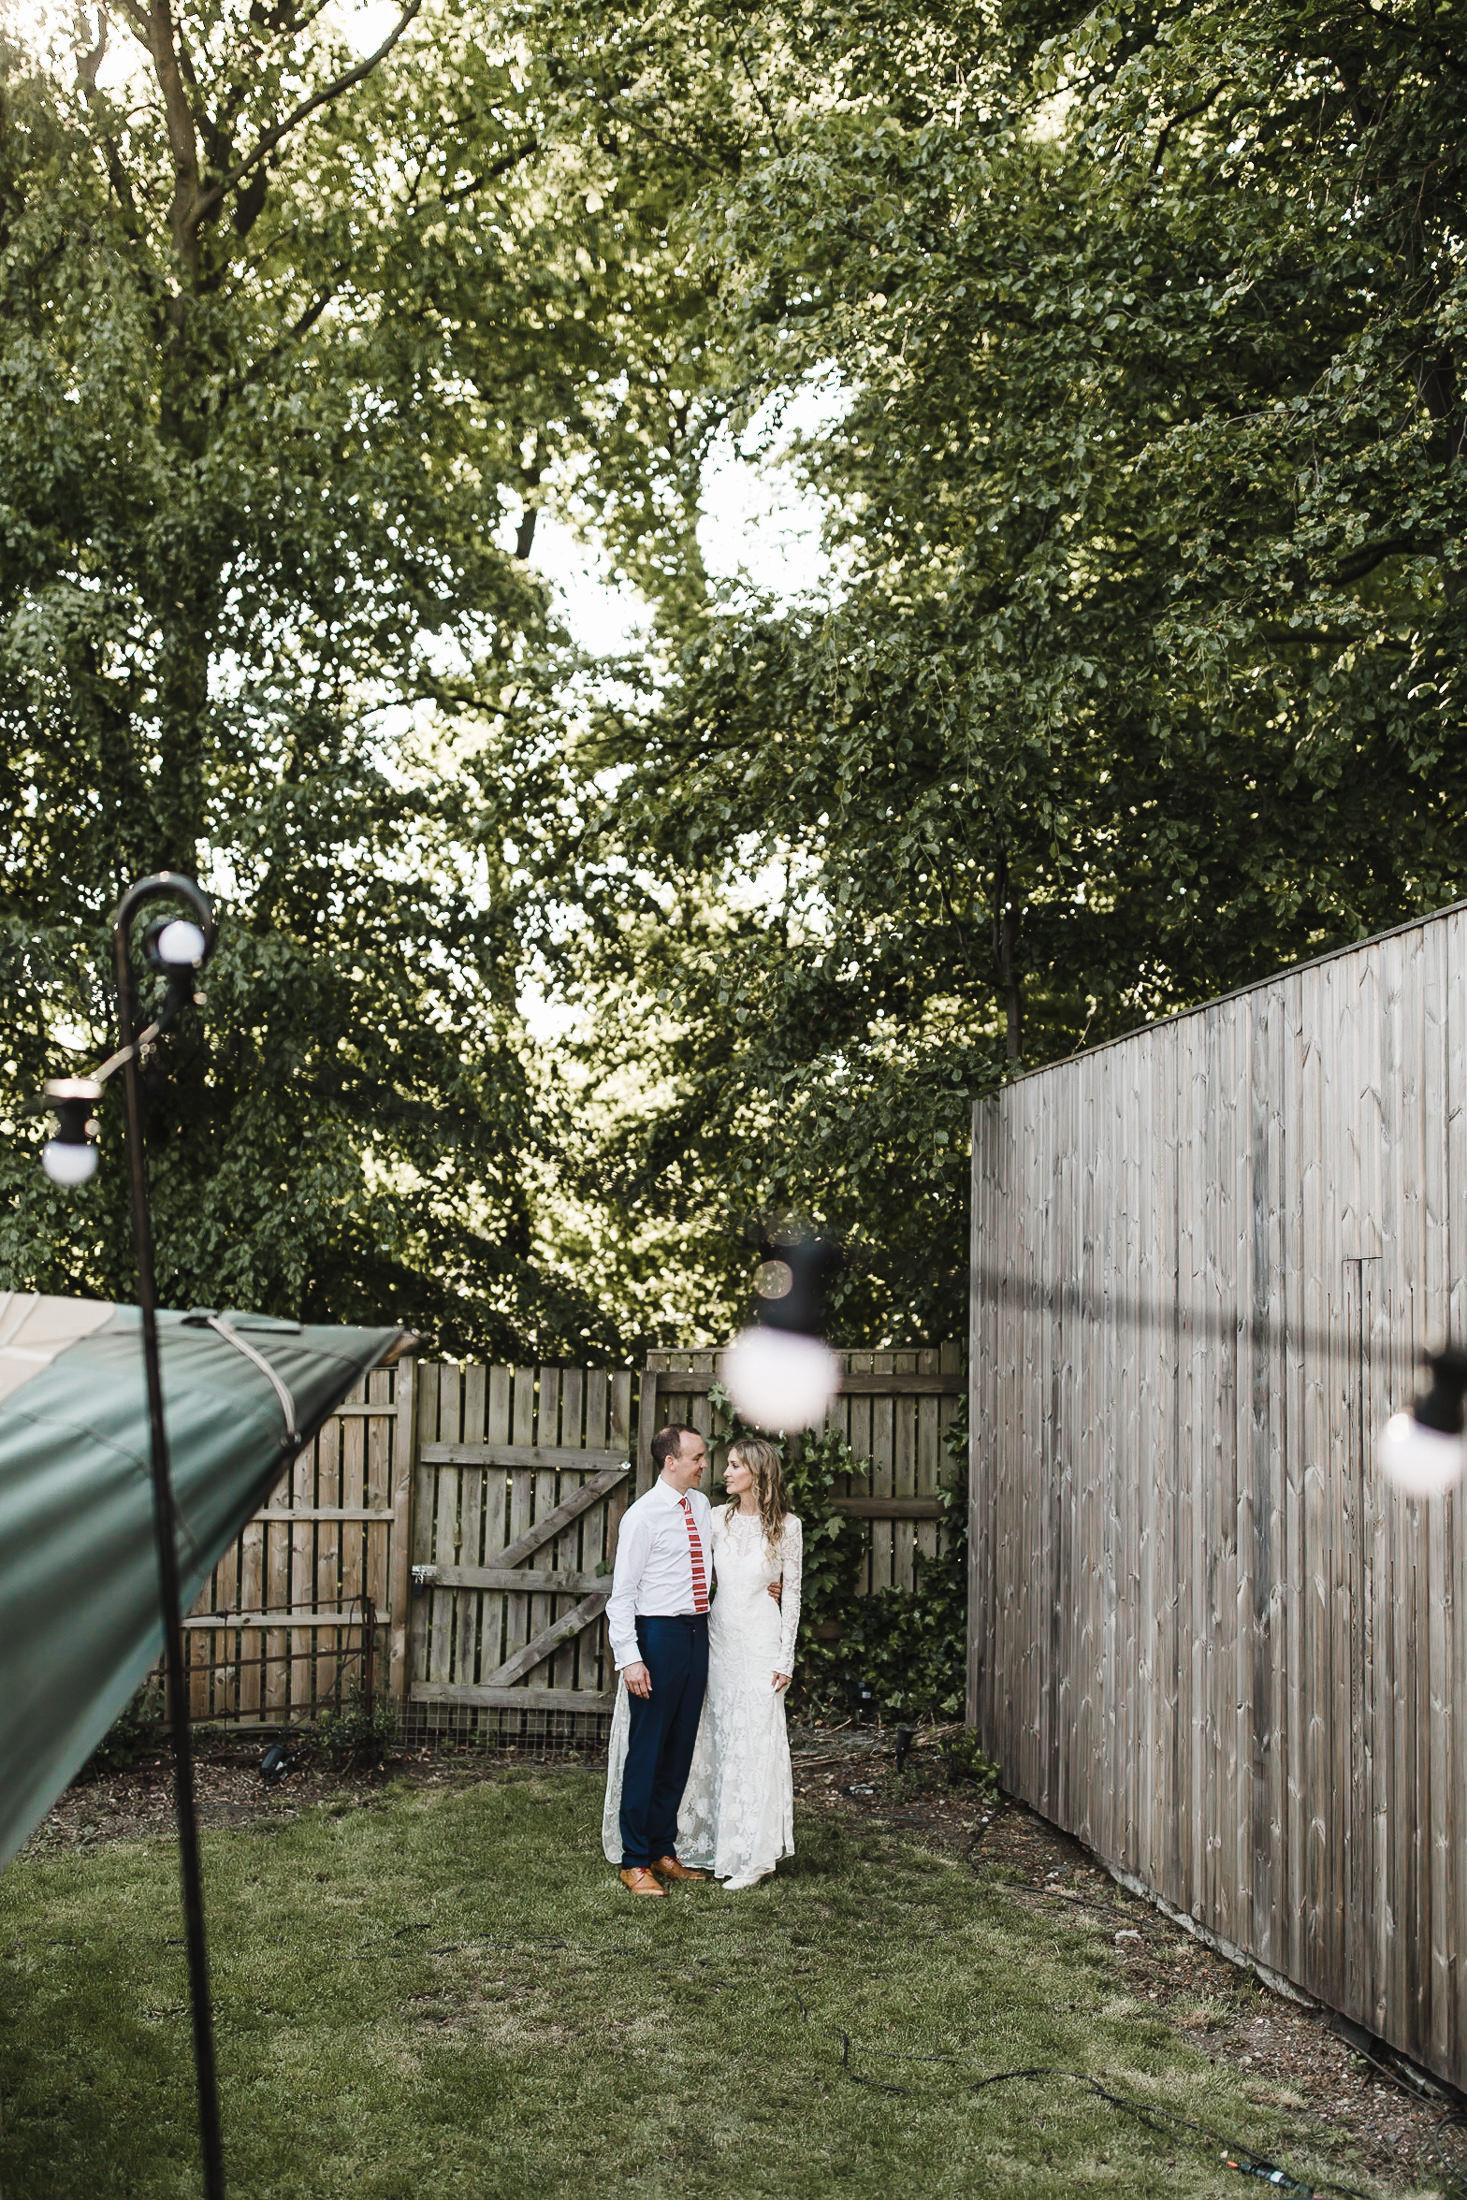 Roundhay-Leeds-Backyard-Wedding-Becs-Chris-179.jpg